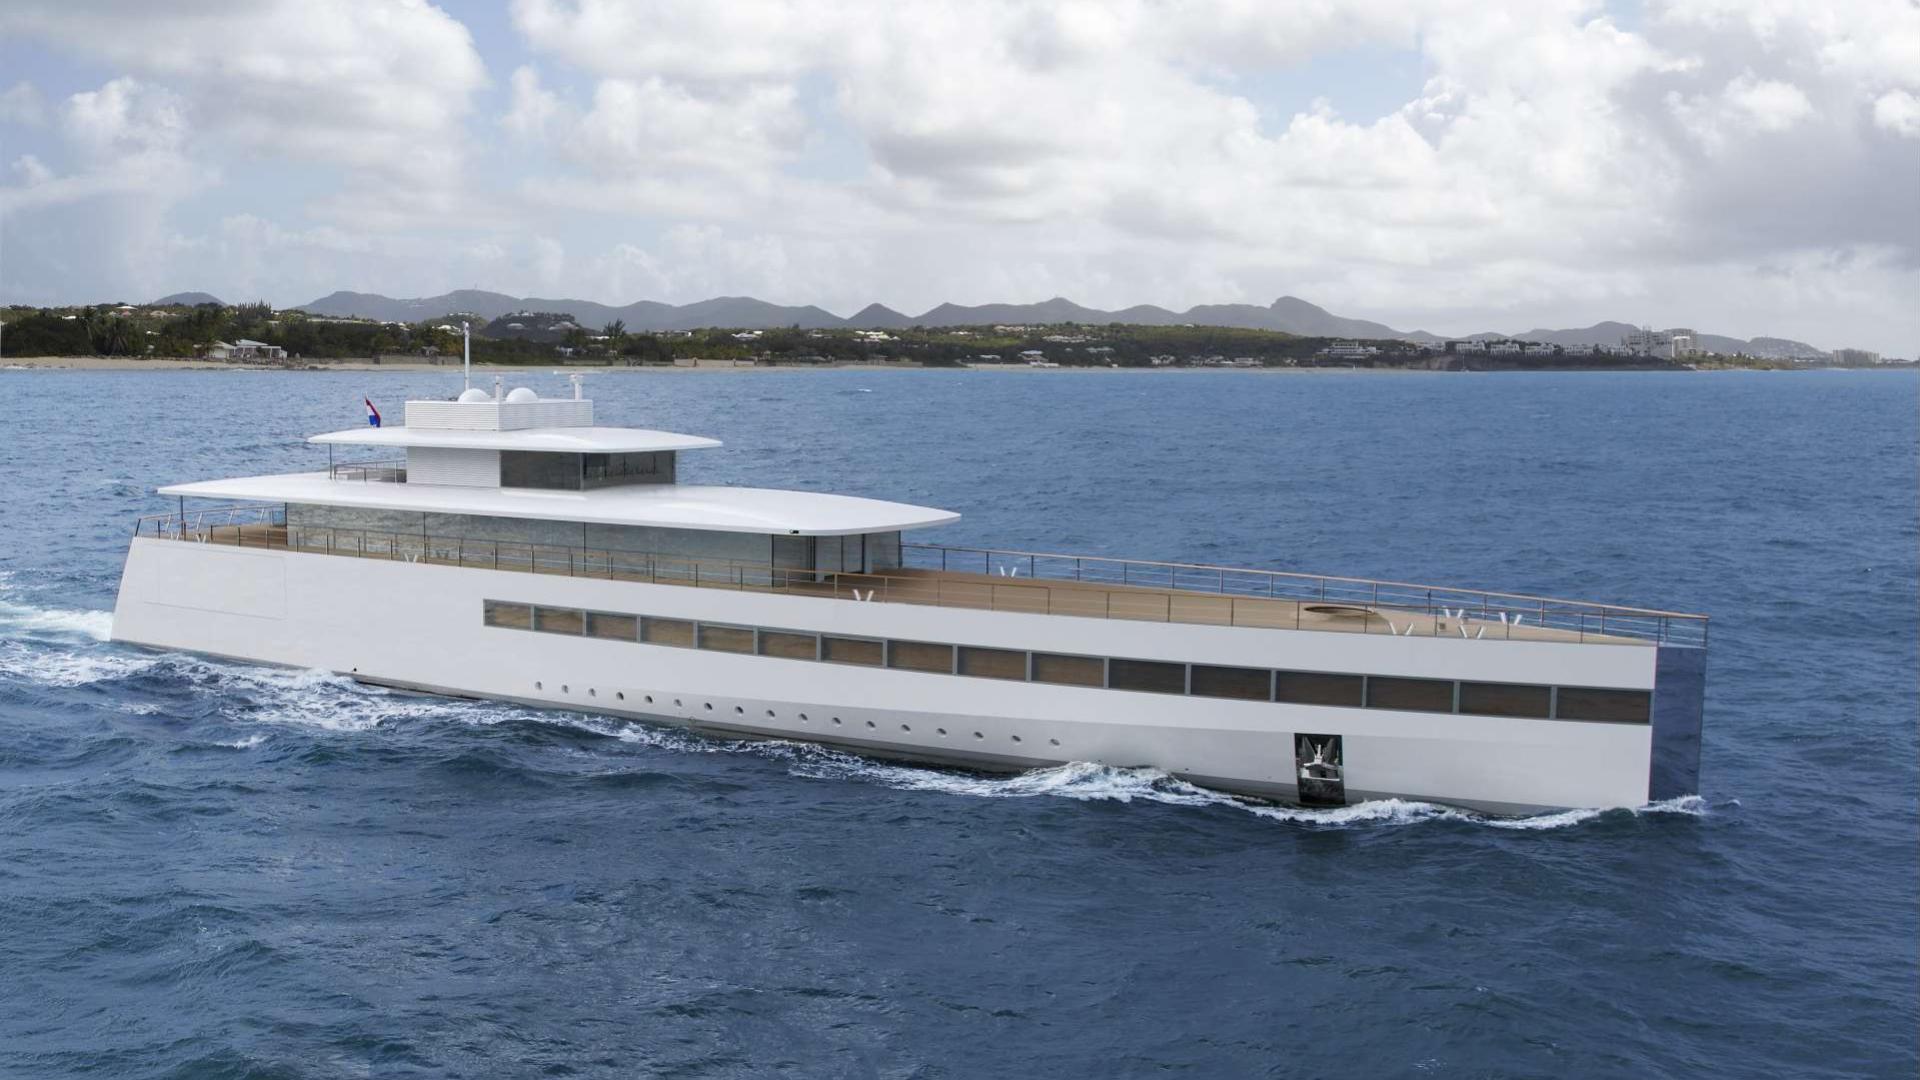 Steve Jobs superyacht Venus cruising